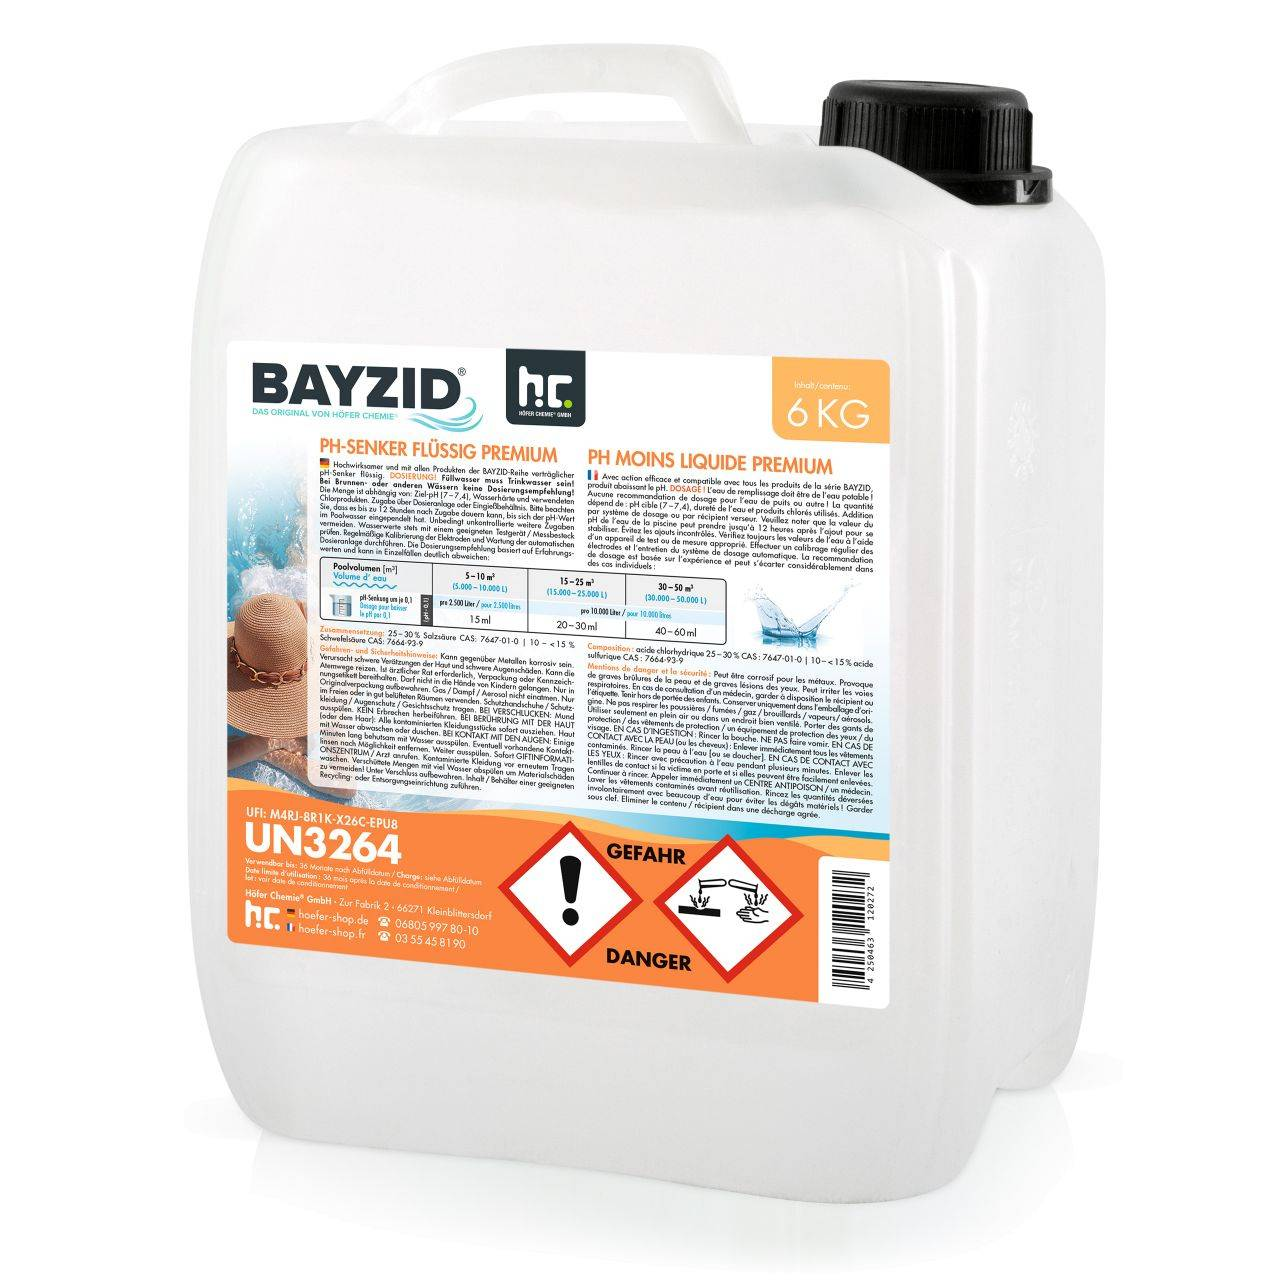 BAYZID 6 kg pH moins liquide (1 x 6 kg)